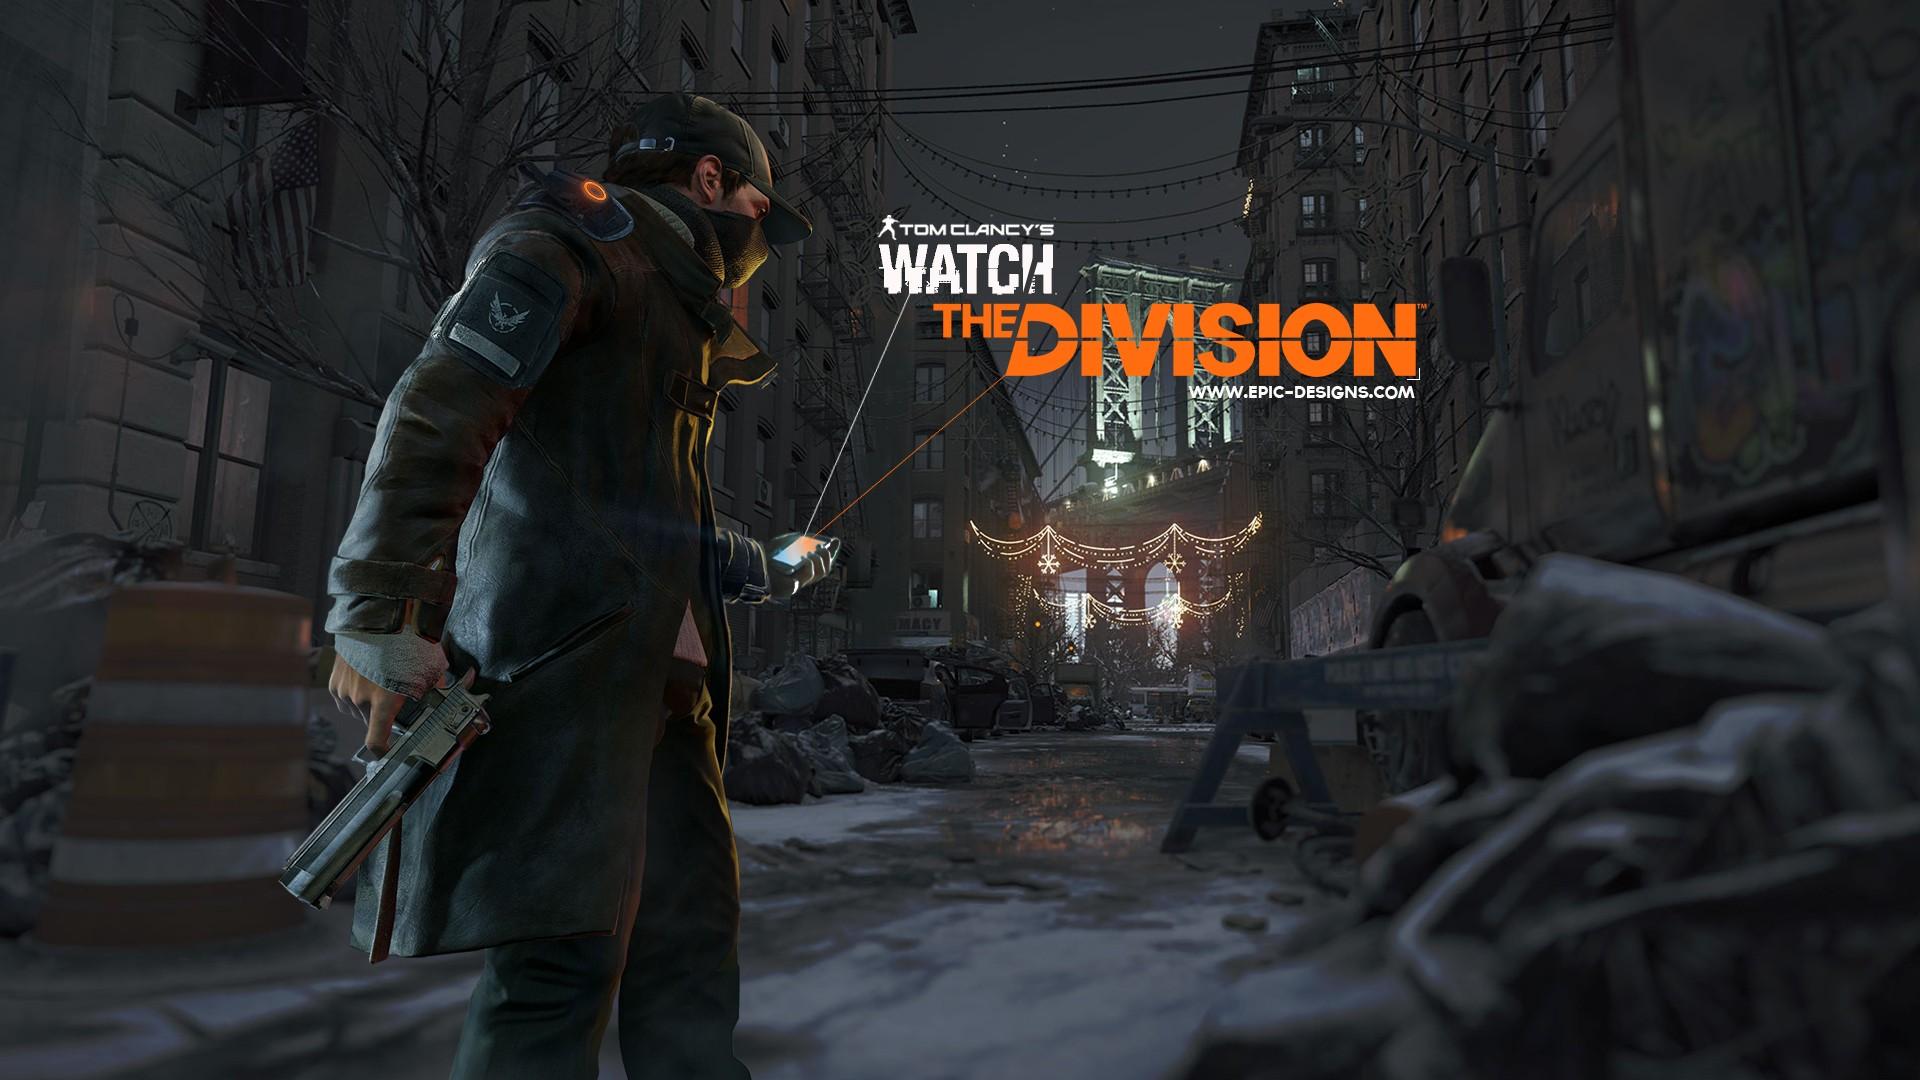 The division фото на аву